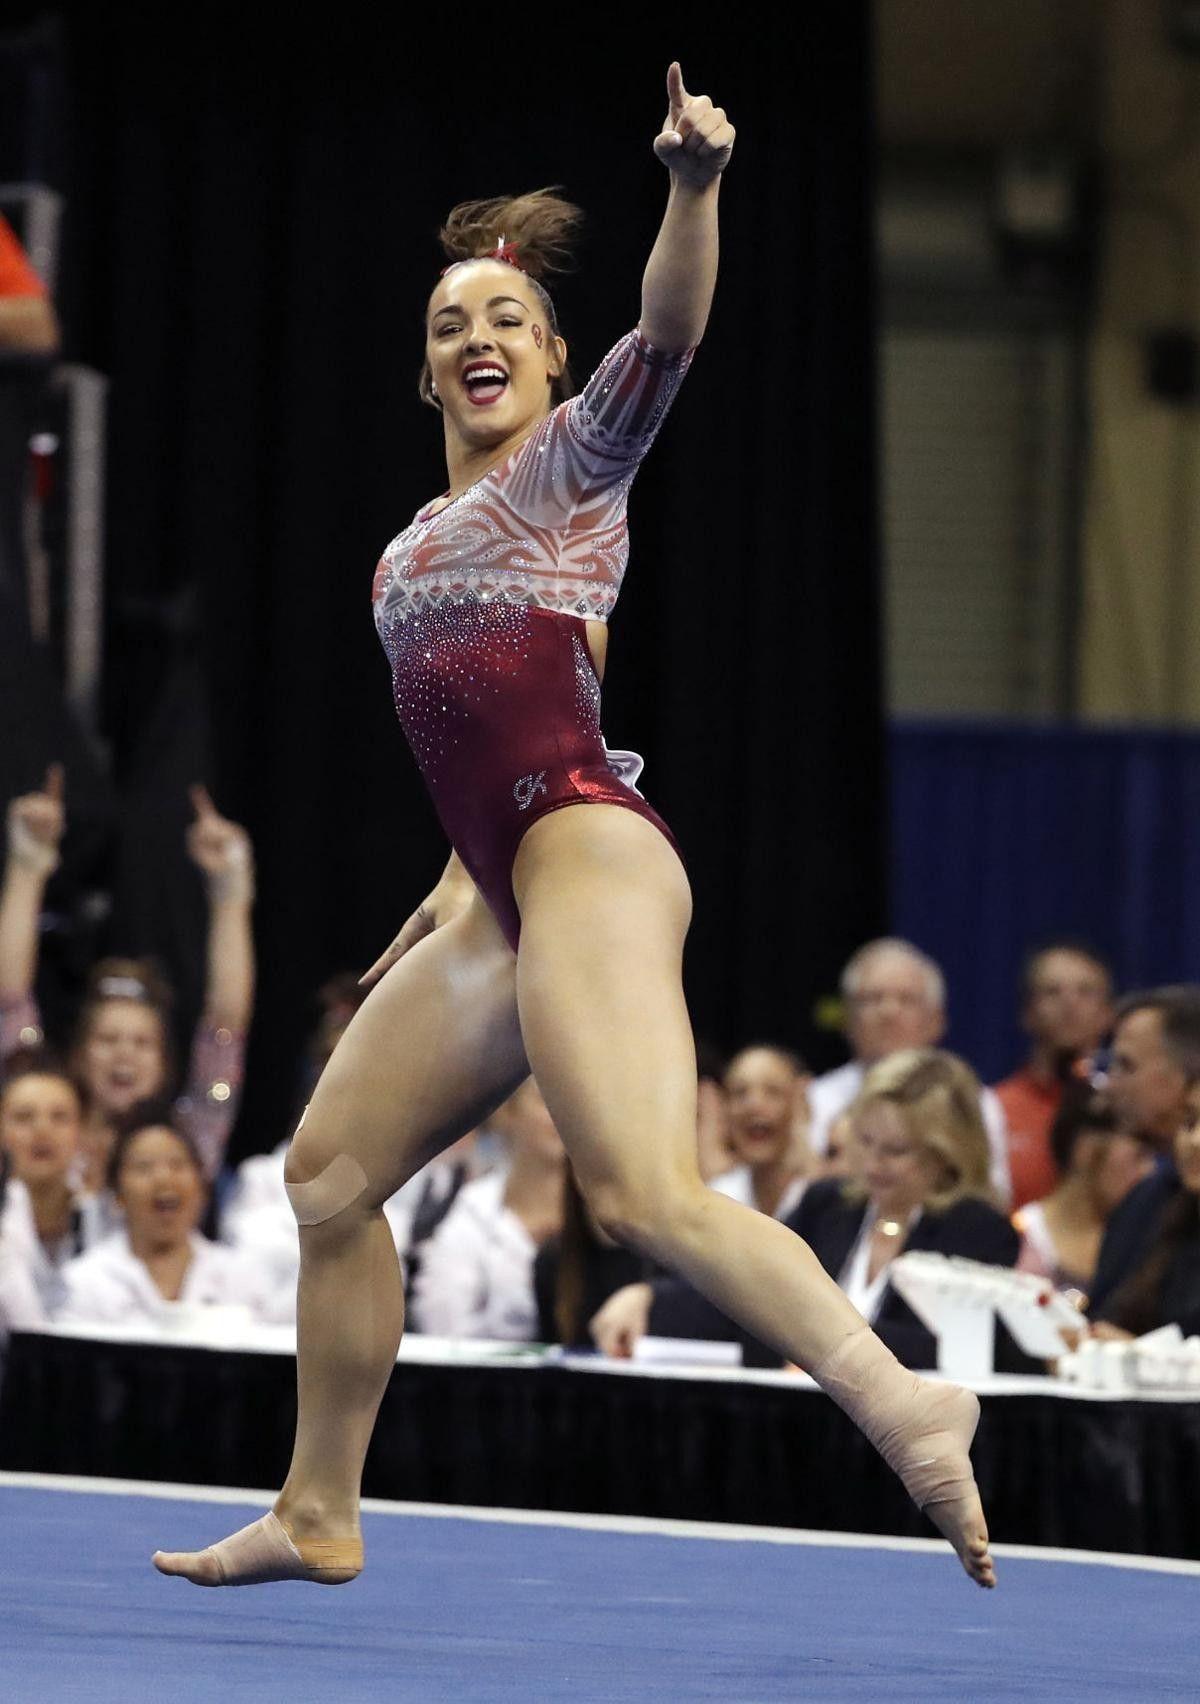 Great Artistic Gymnastics Shot   Gymnastic   Pinterest